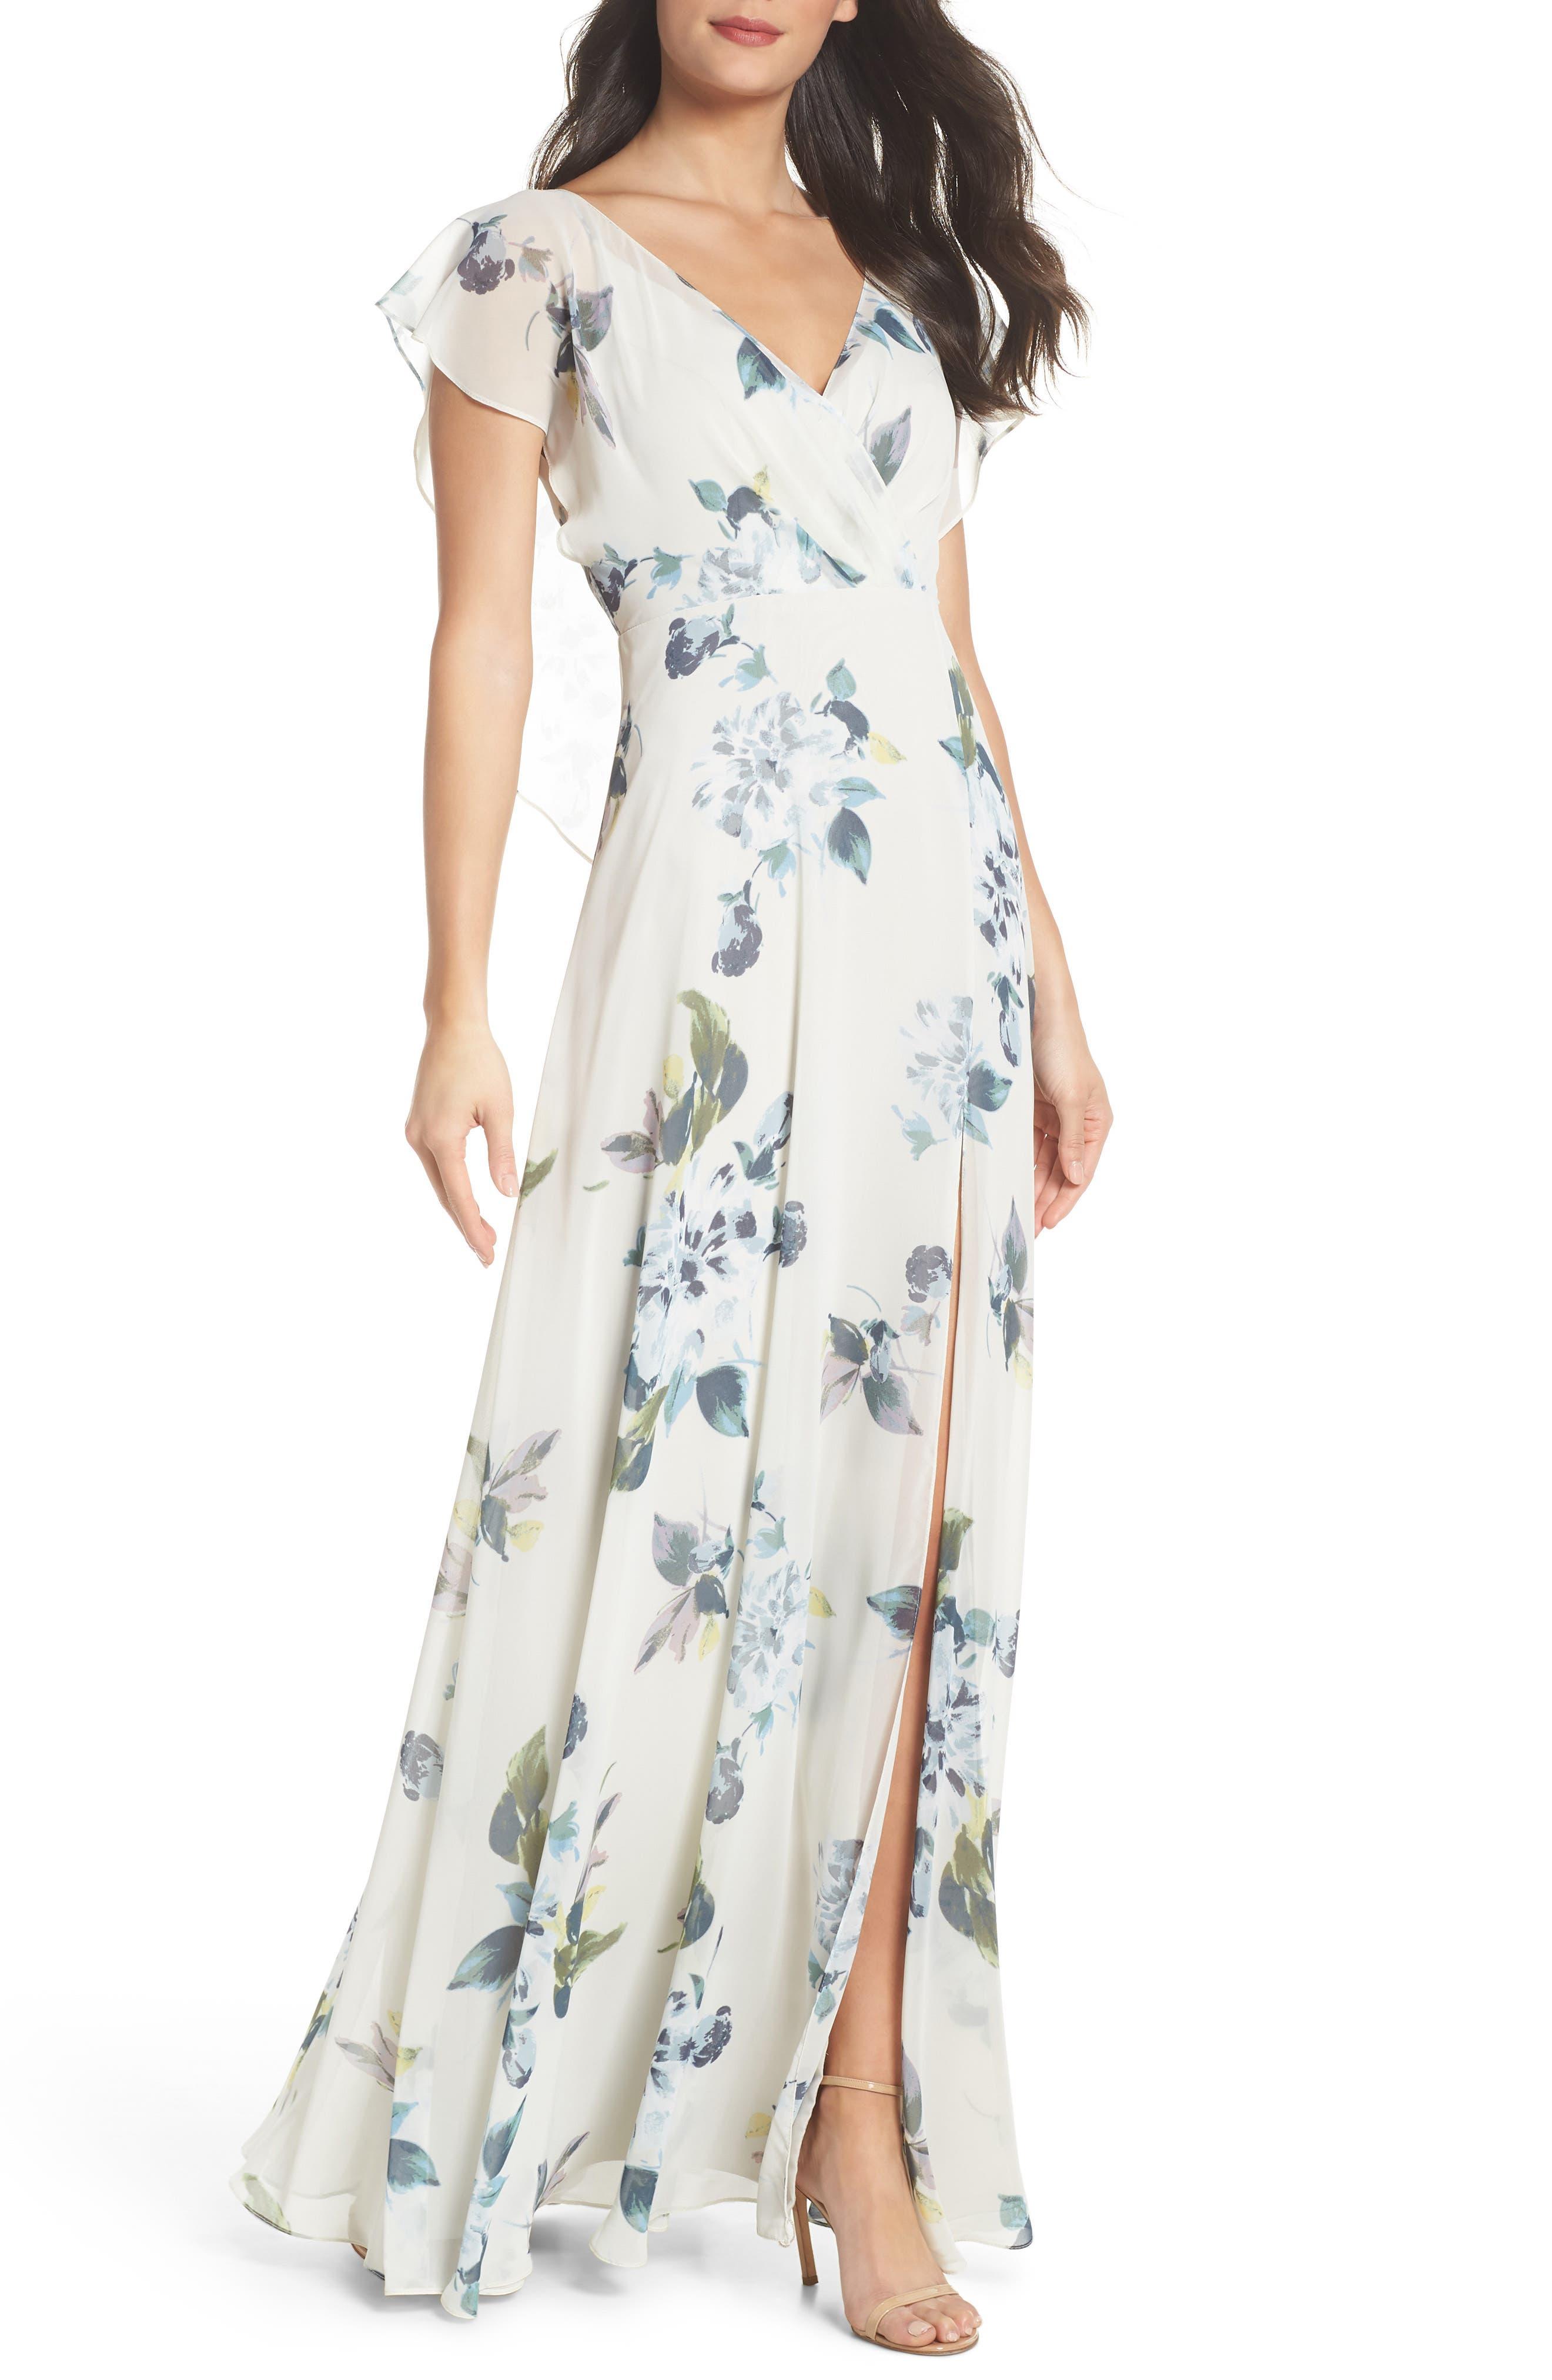 Alanna Ohana Print Open Back Print Chiffon Gown,                         Main,                         color, Soft Sage Blue